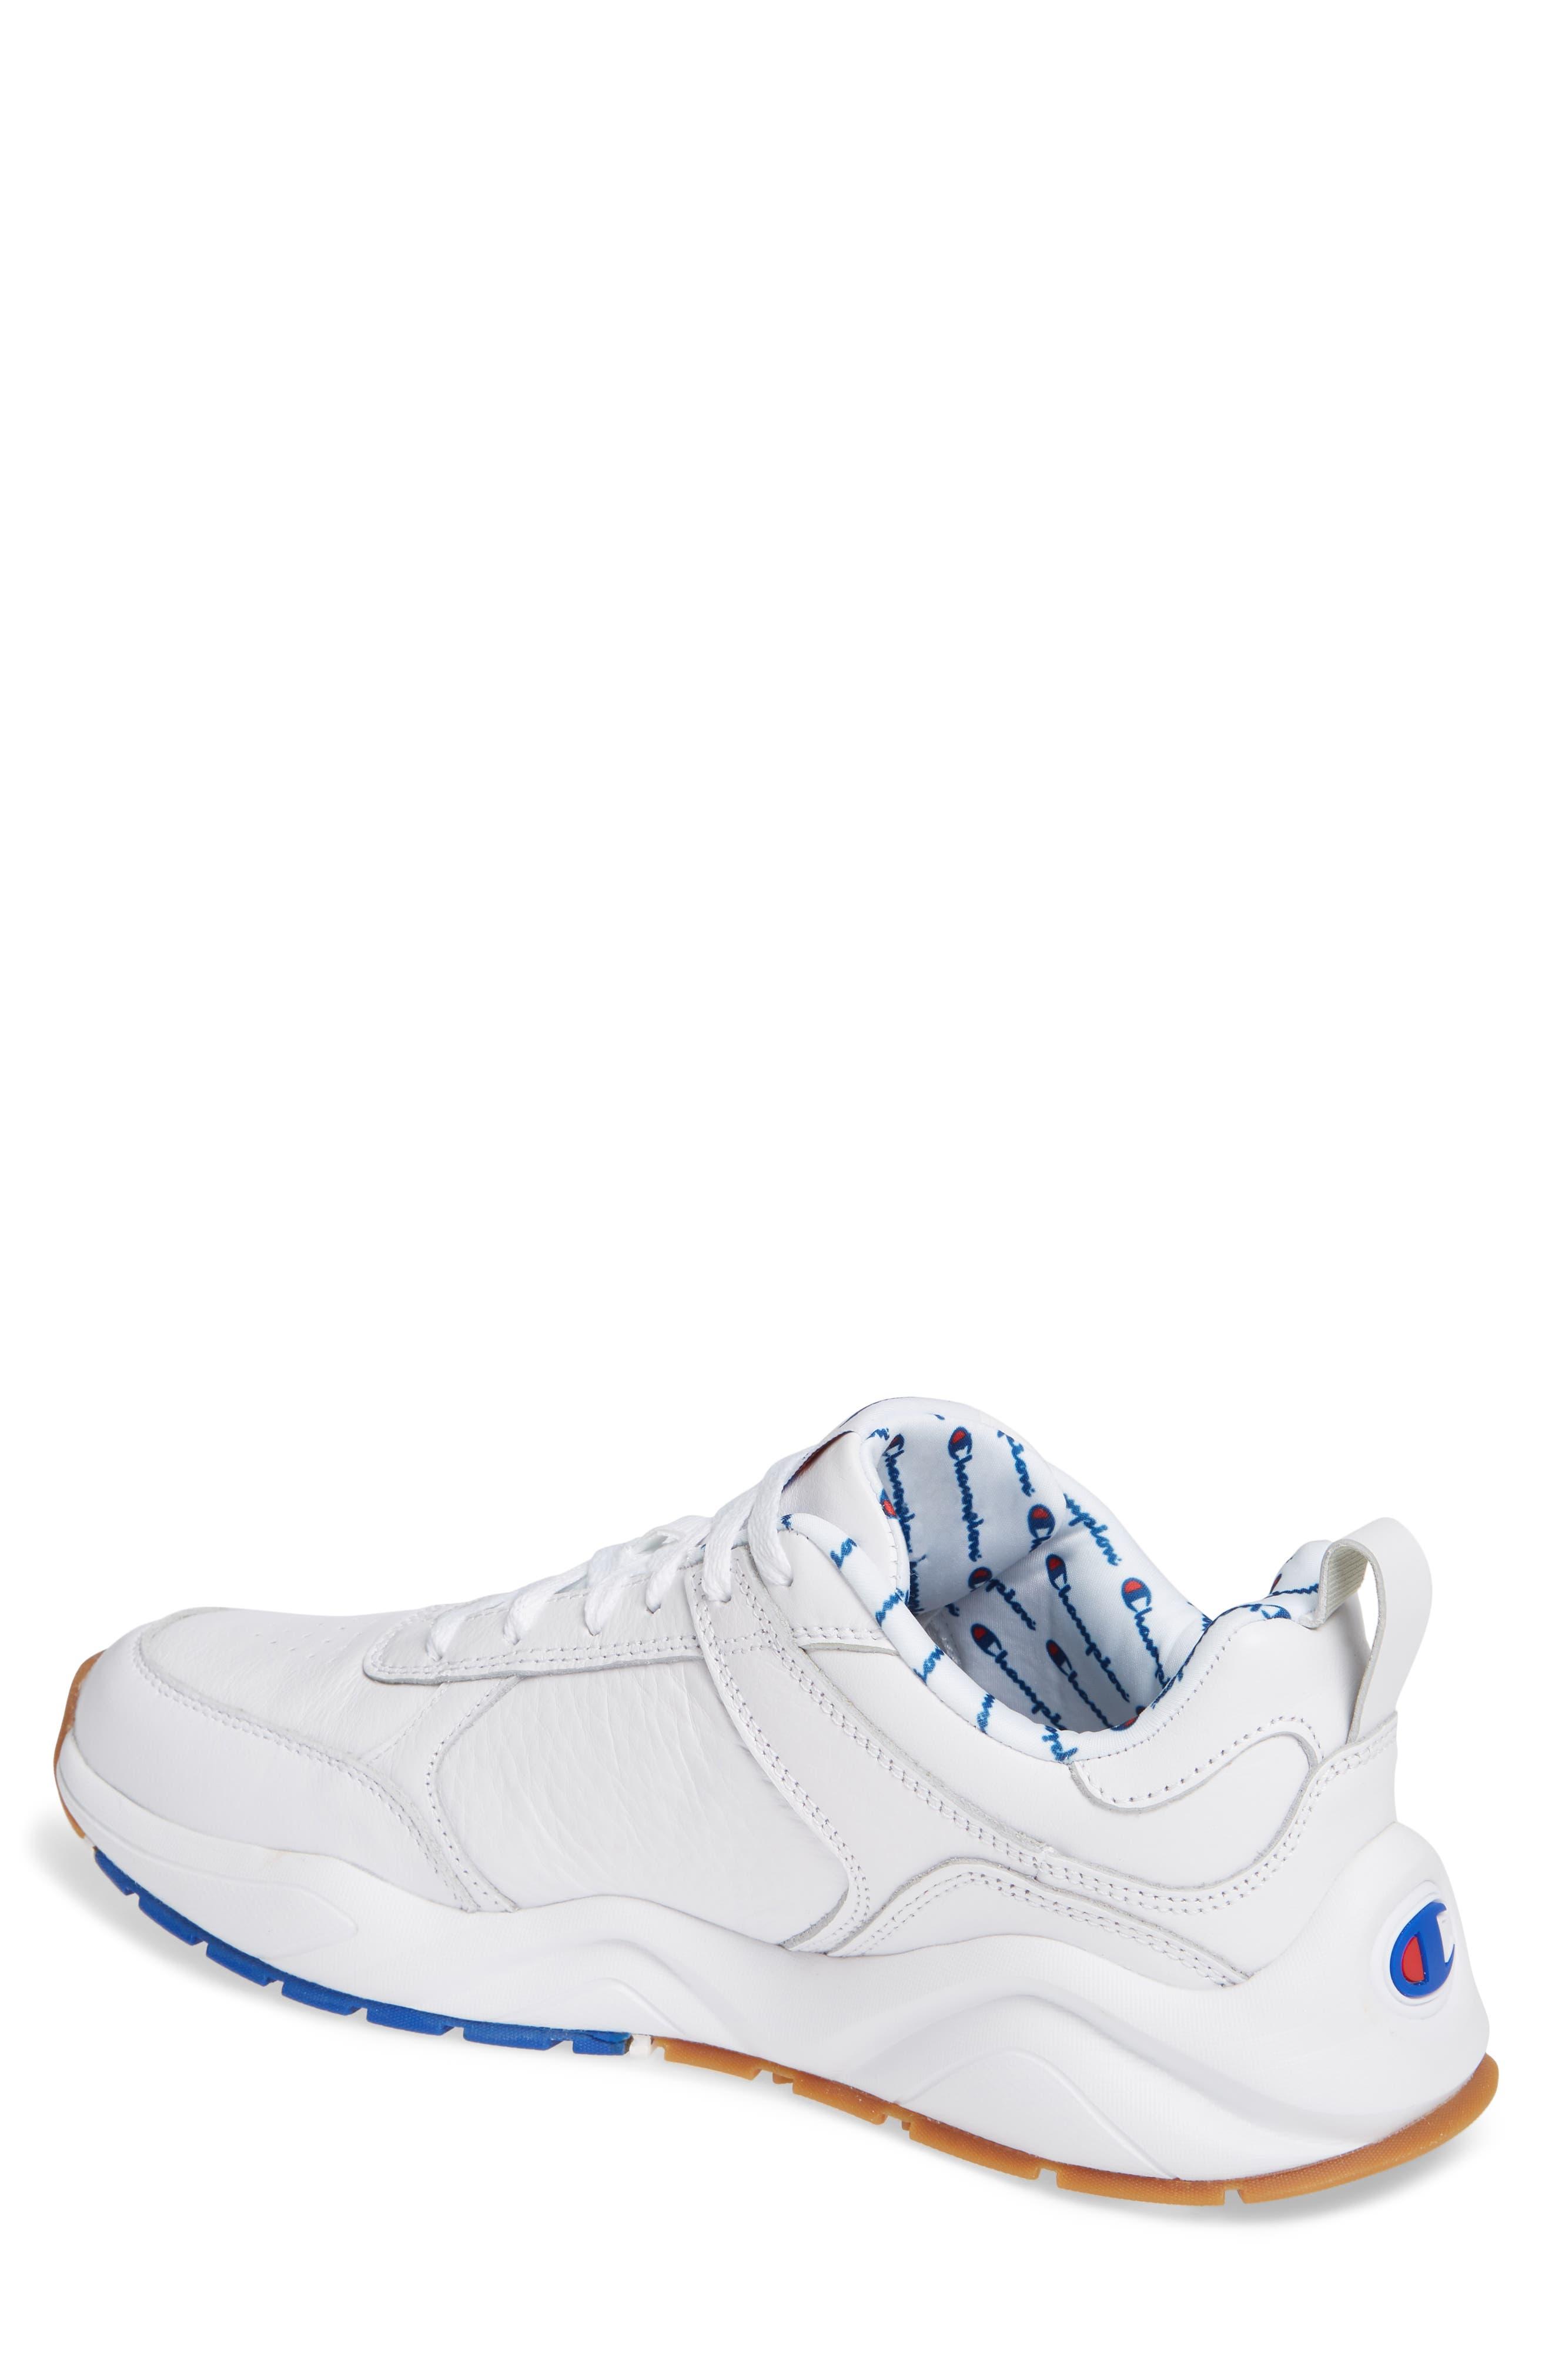 Bones Big-C Sneaker,                             Alternate thumbnail 2, color,                             WHITE